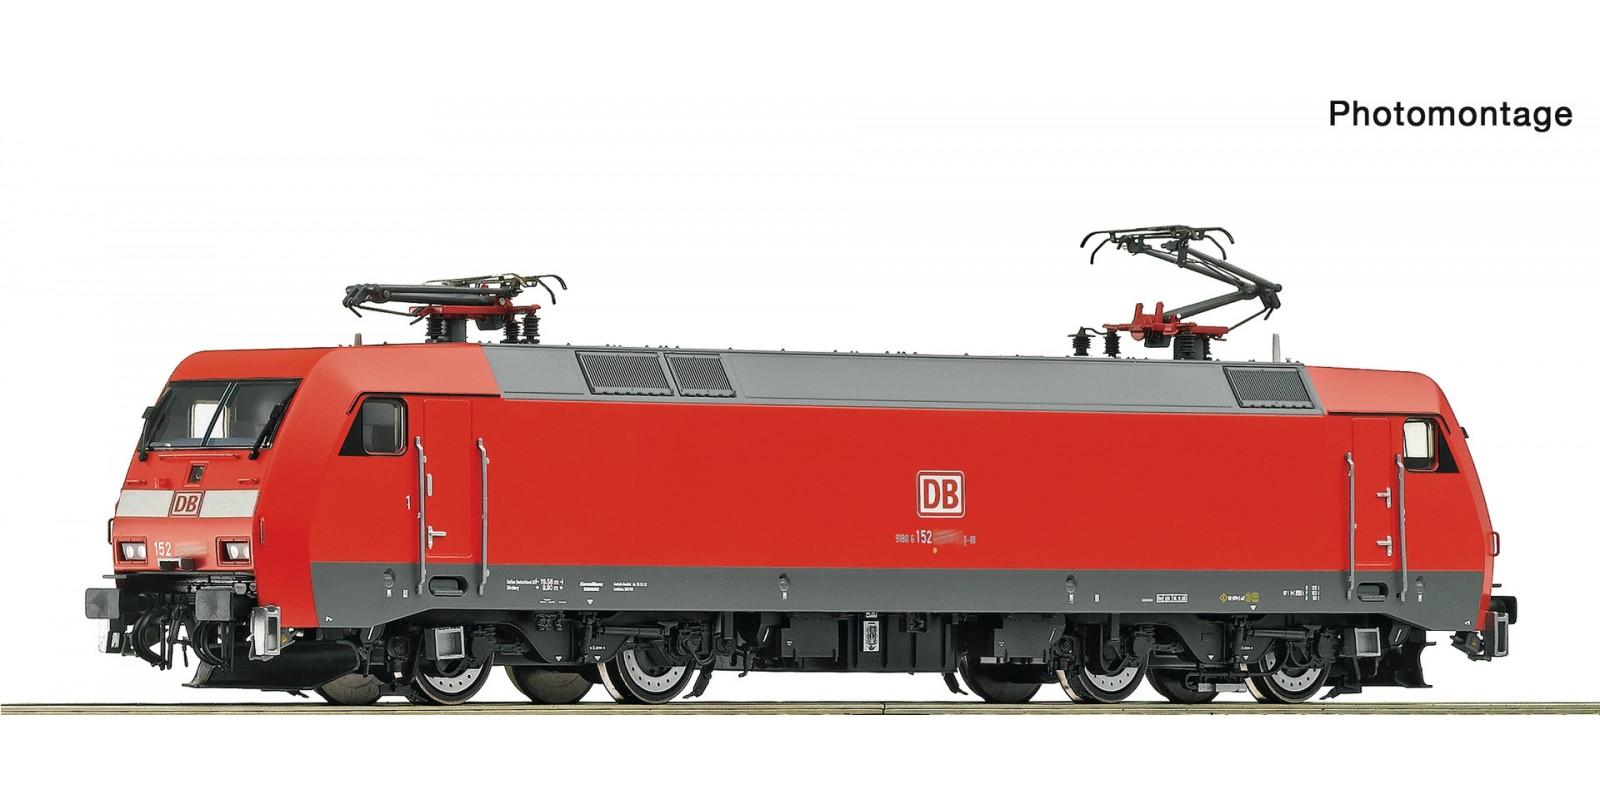 RO73166 Electric locomotive class 152